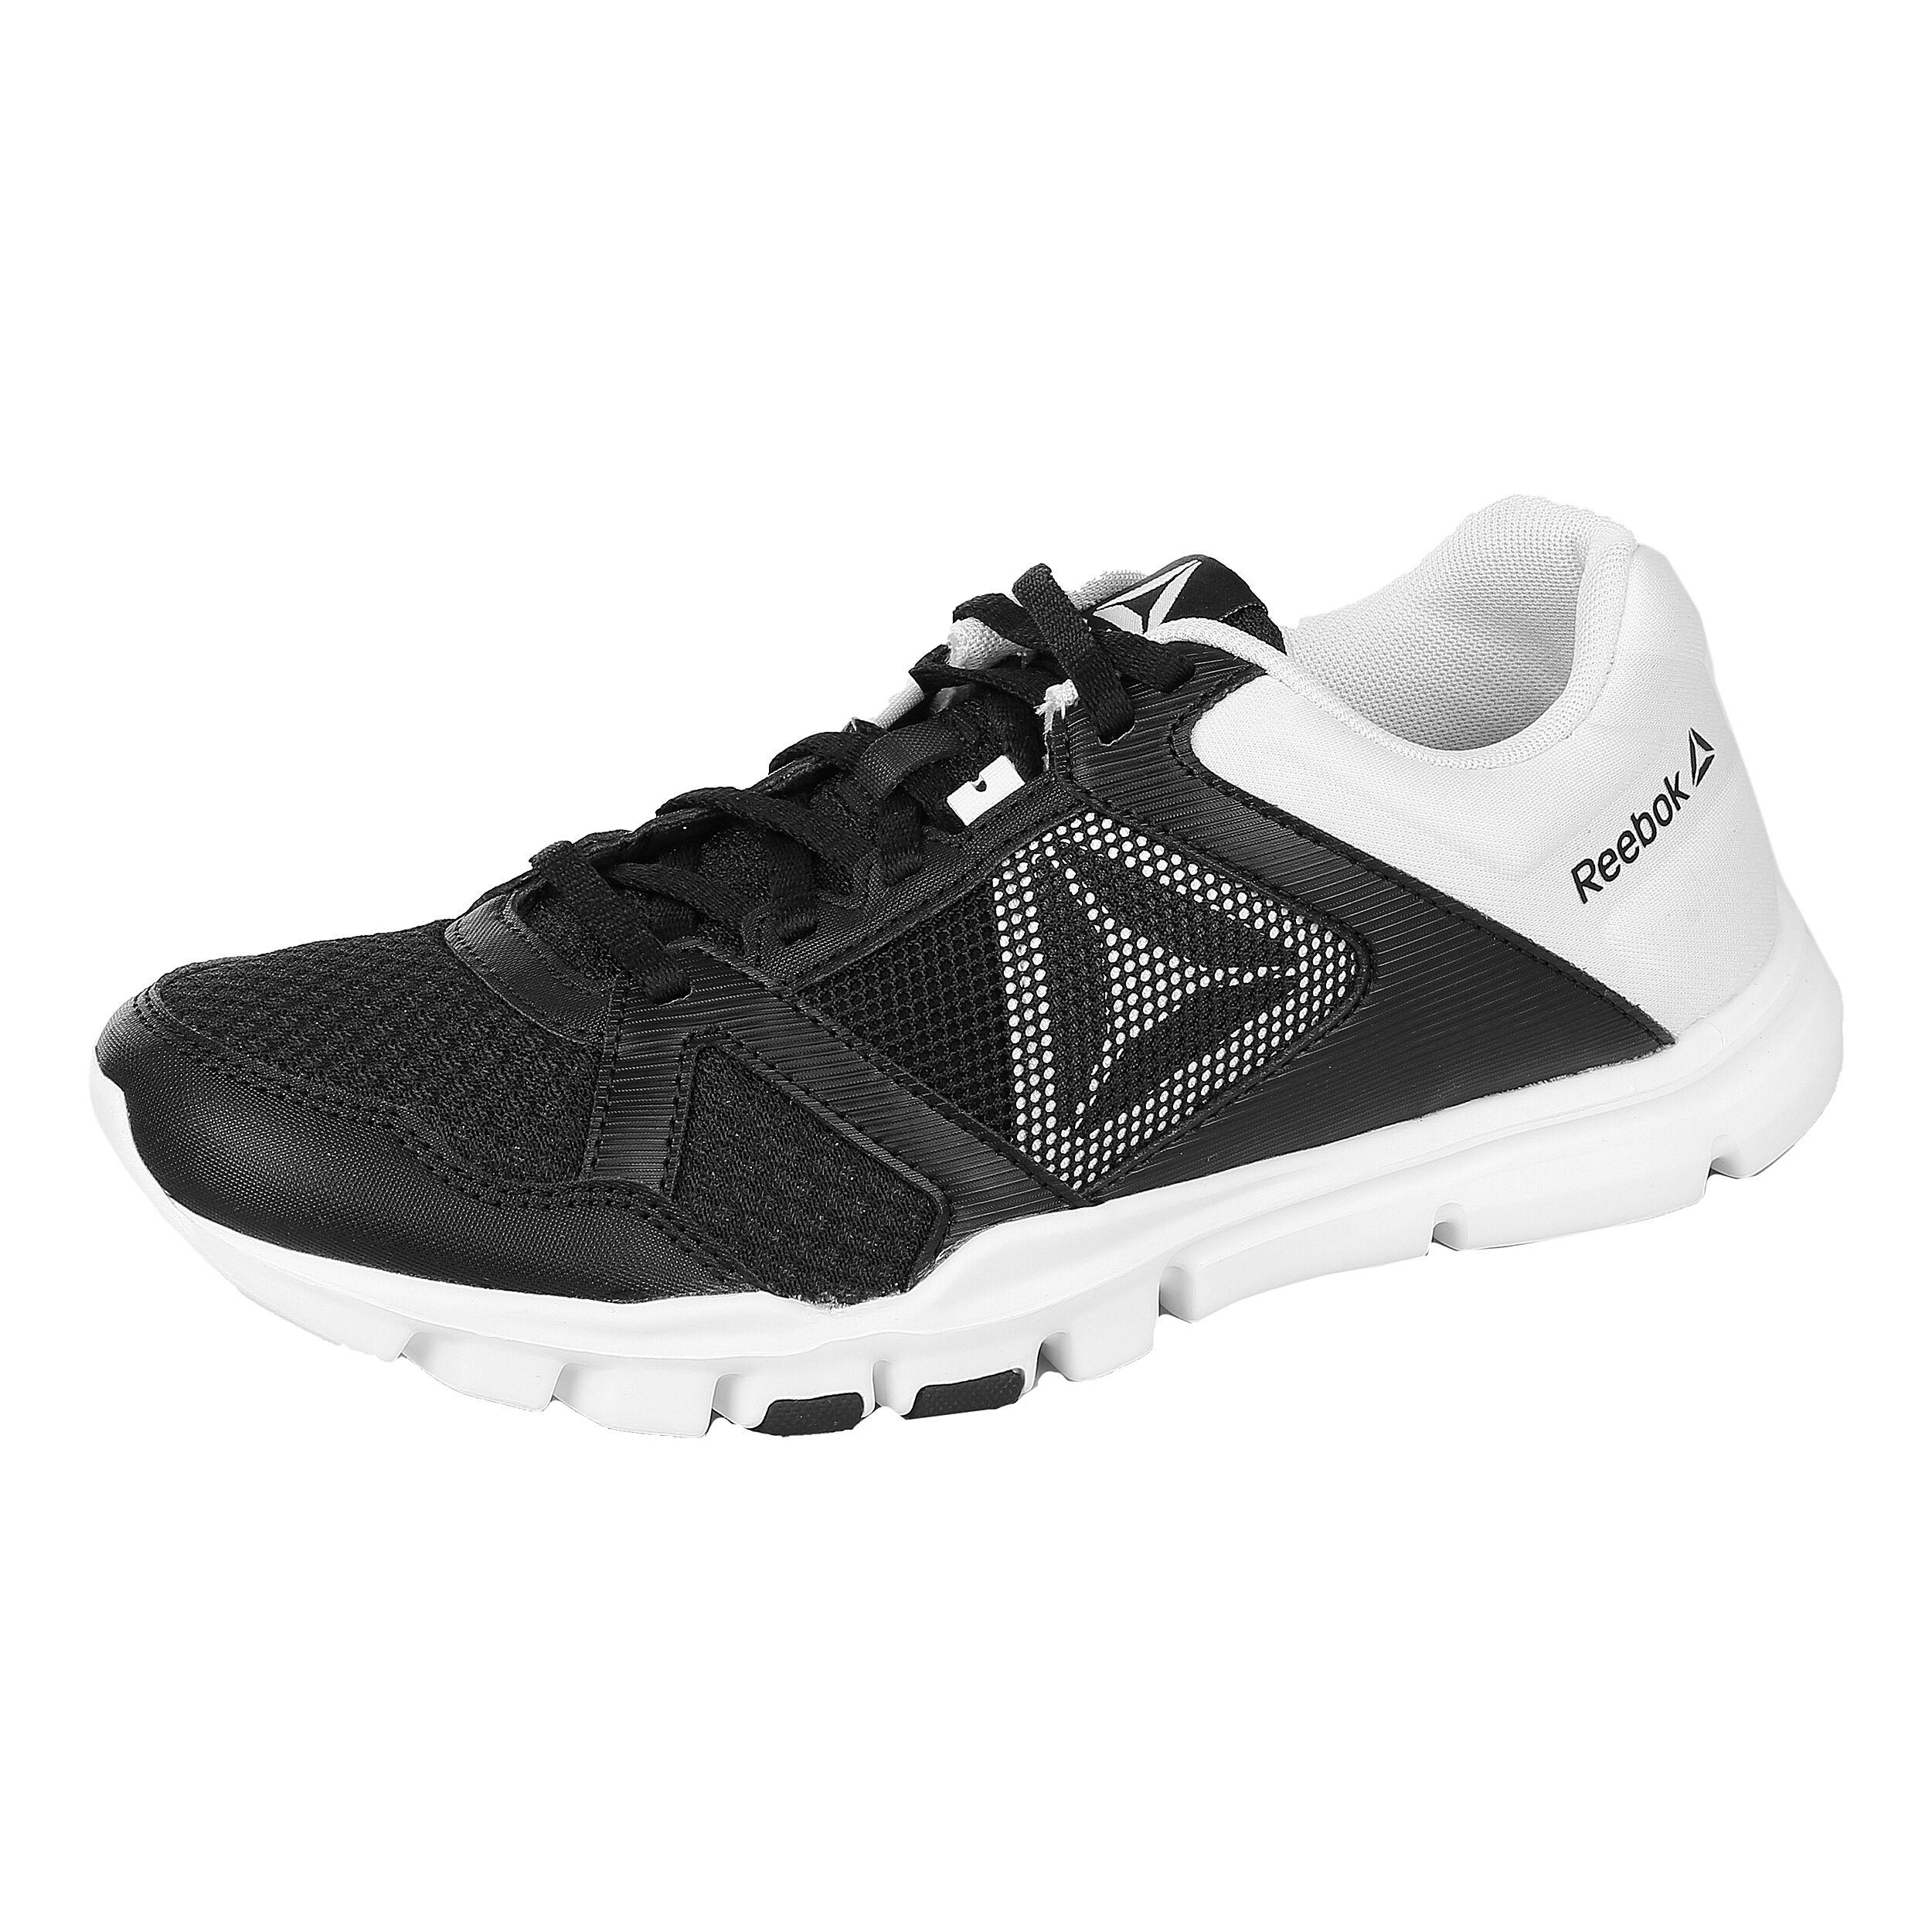 chaussure basse femme yourflex trainette noir